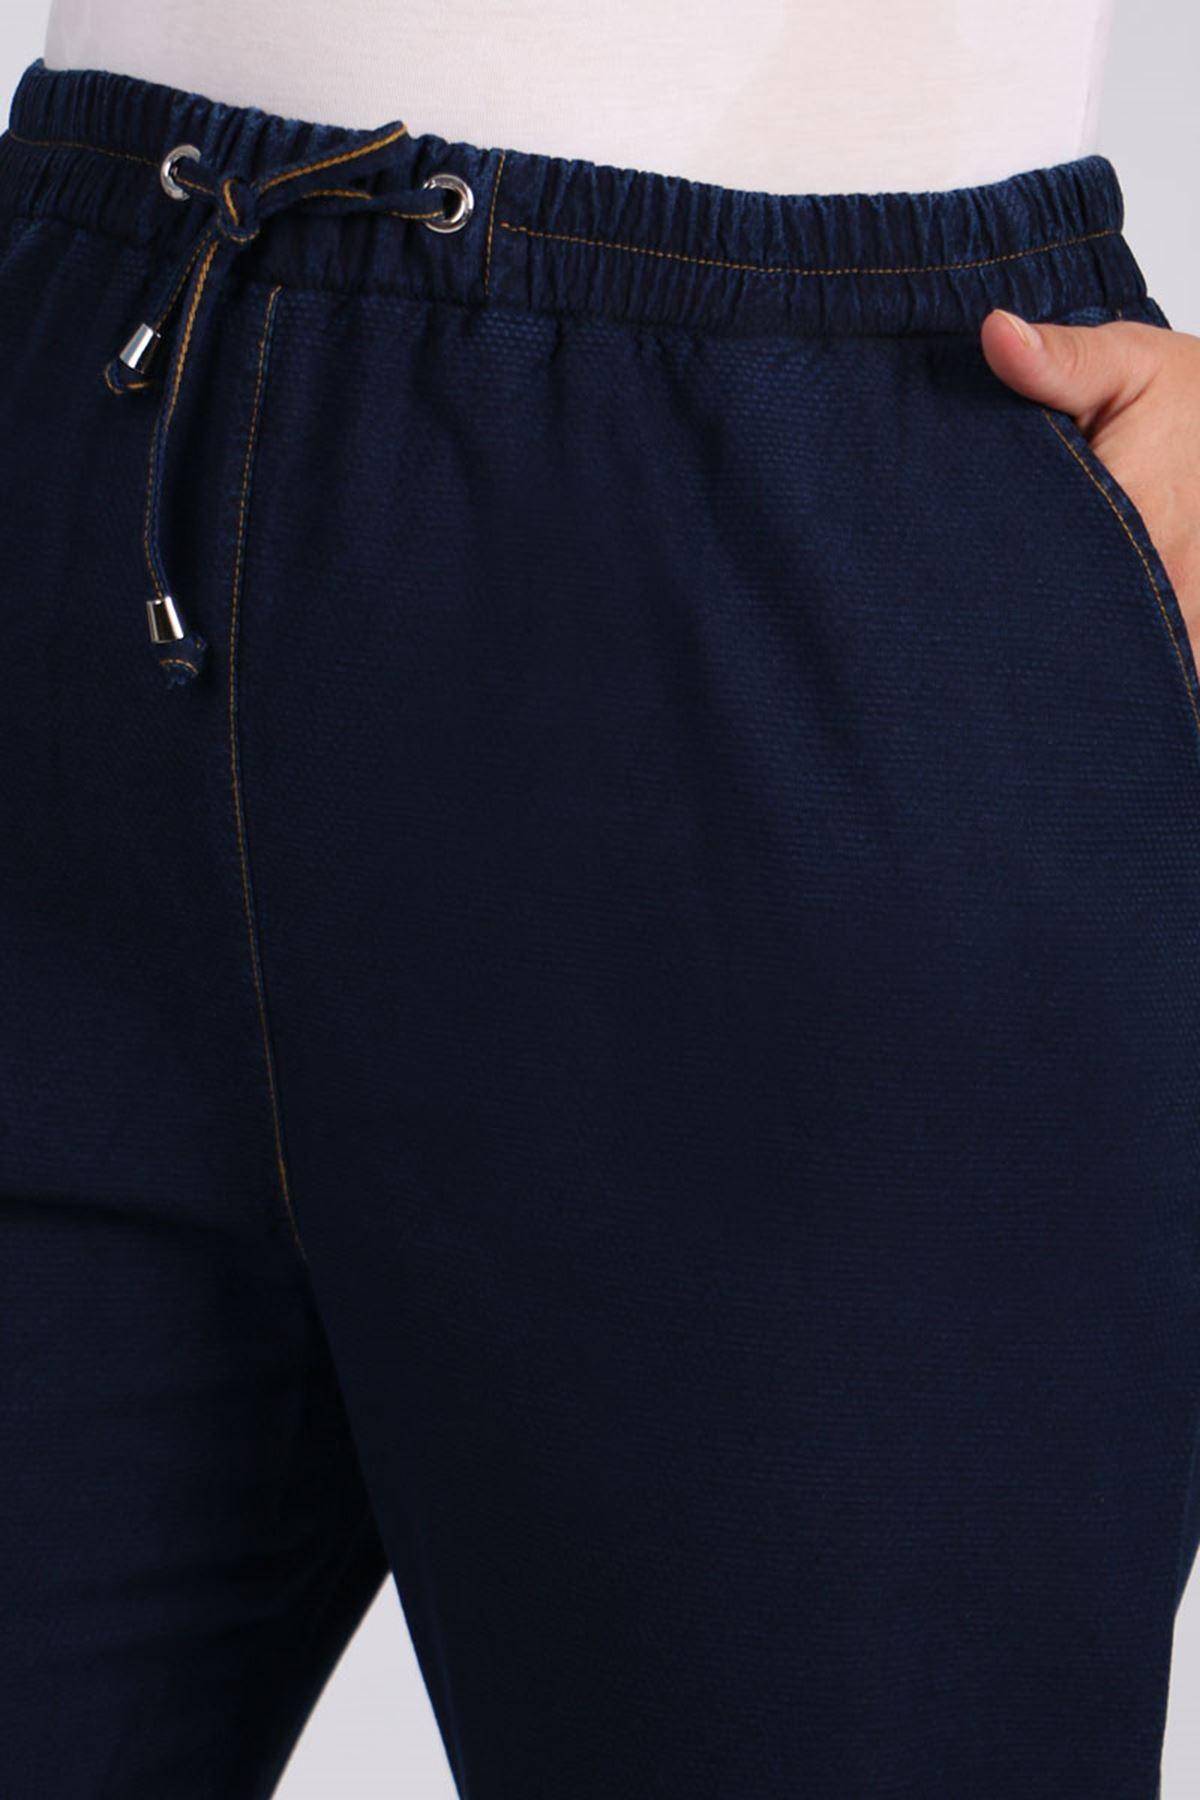 9154-1 Büyük Beden Dar Paça Kot Pantolon - Koyu Lacivert